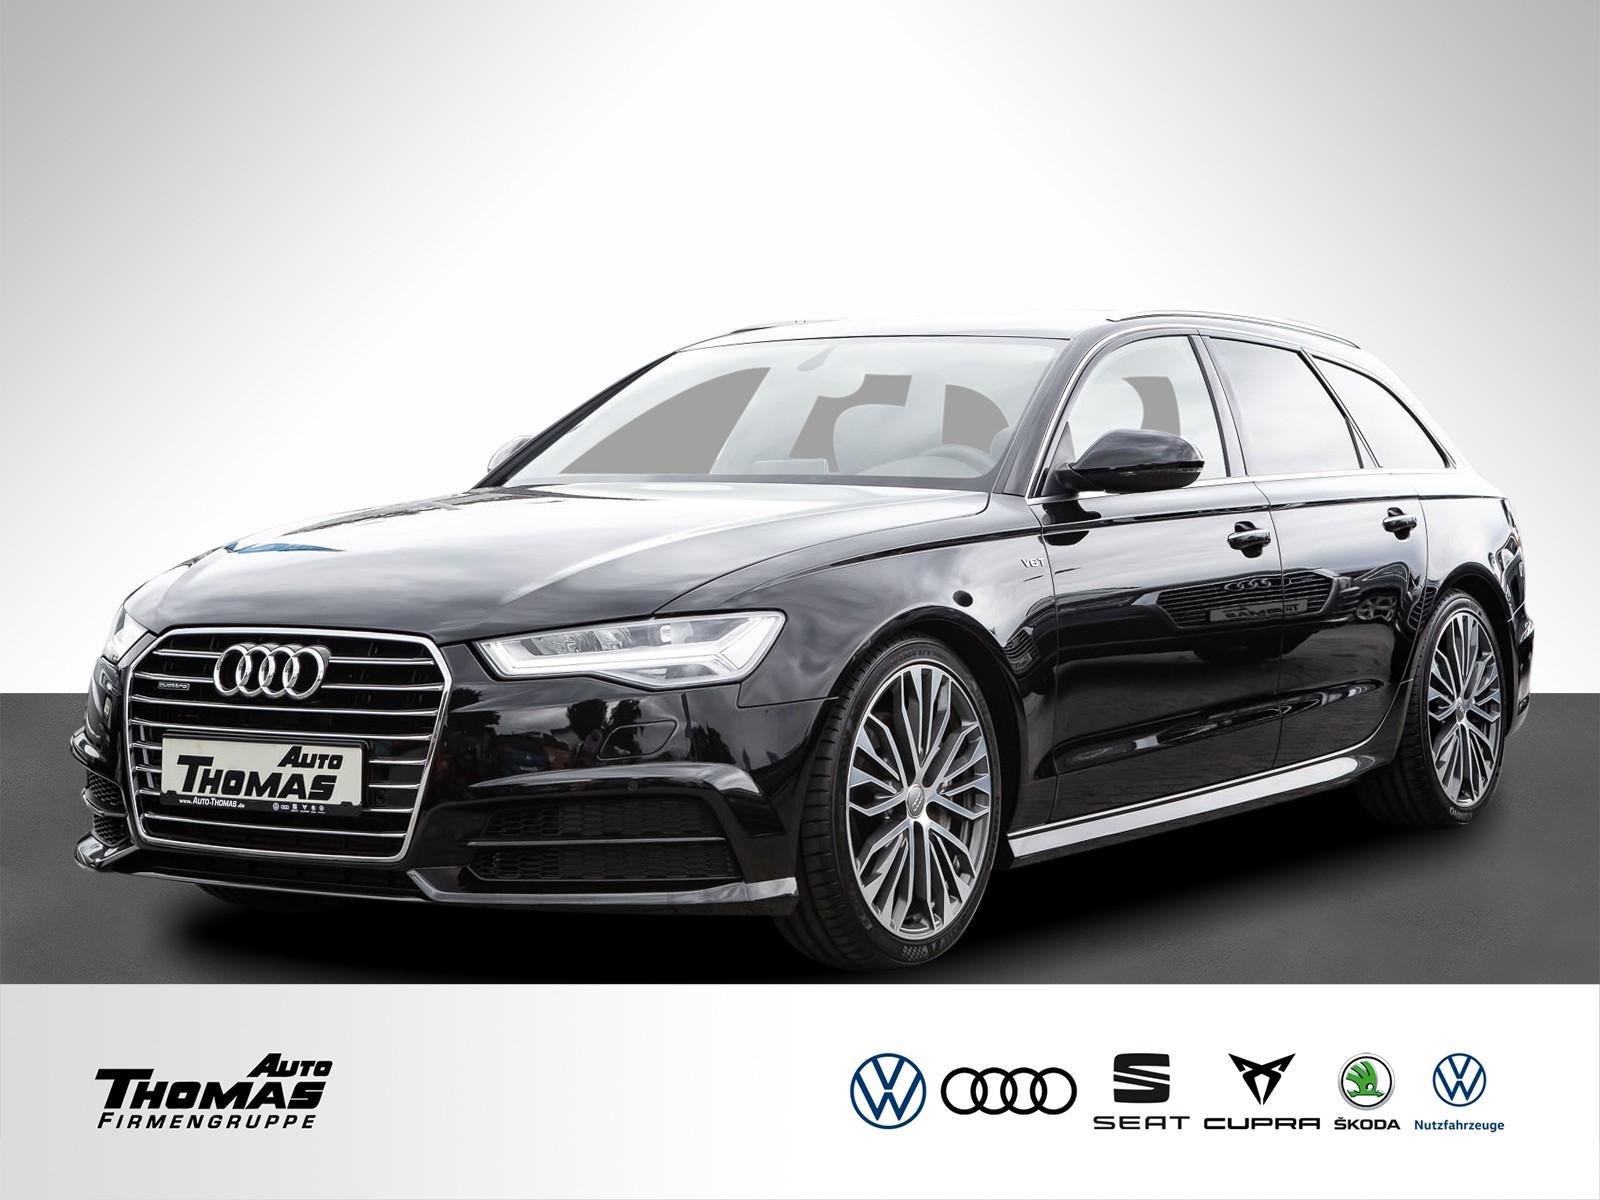 Audi A6 Avant 3.0 TDI quattro 235(320) kW(PS) 8-stufig tiptronic S-Line, Jahr 2018, Diesel